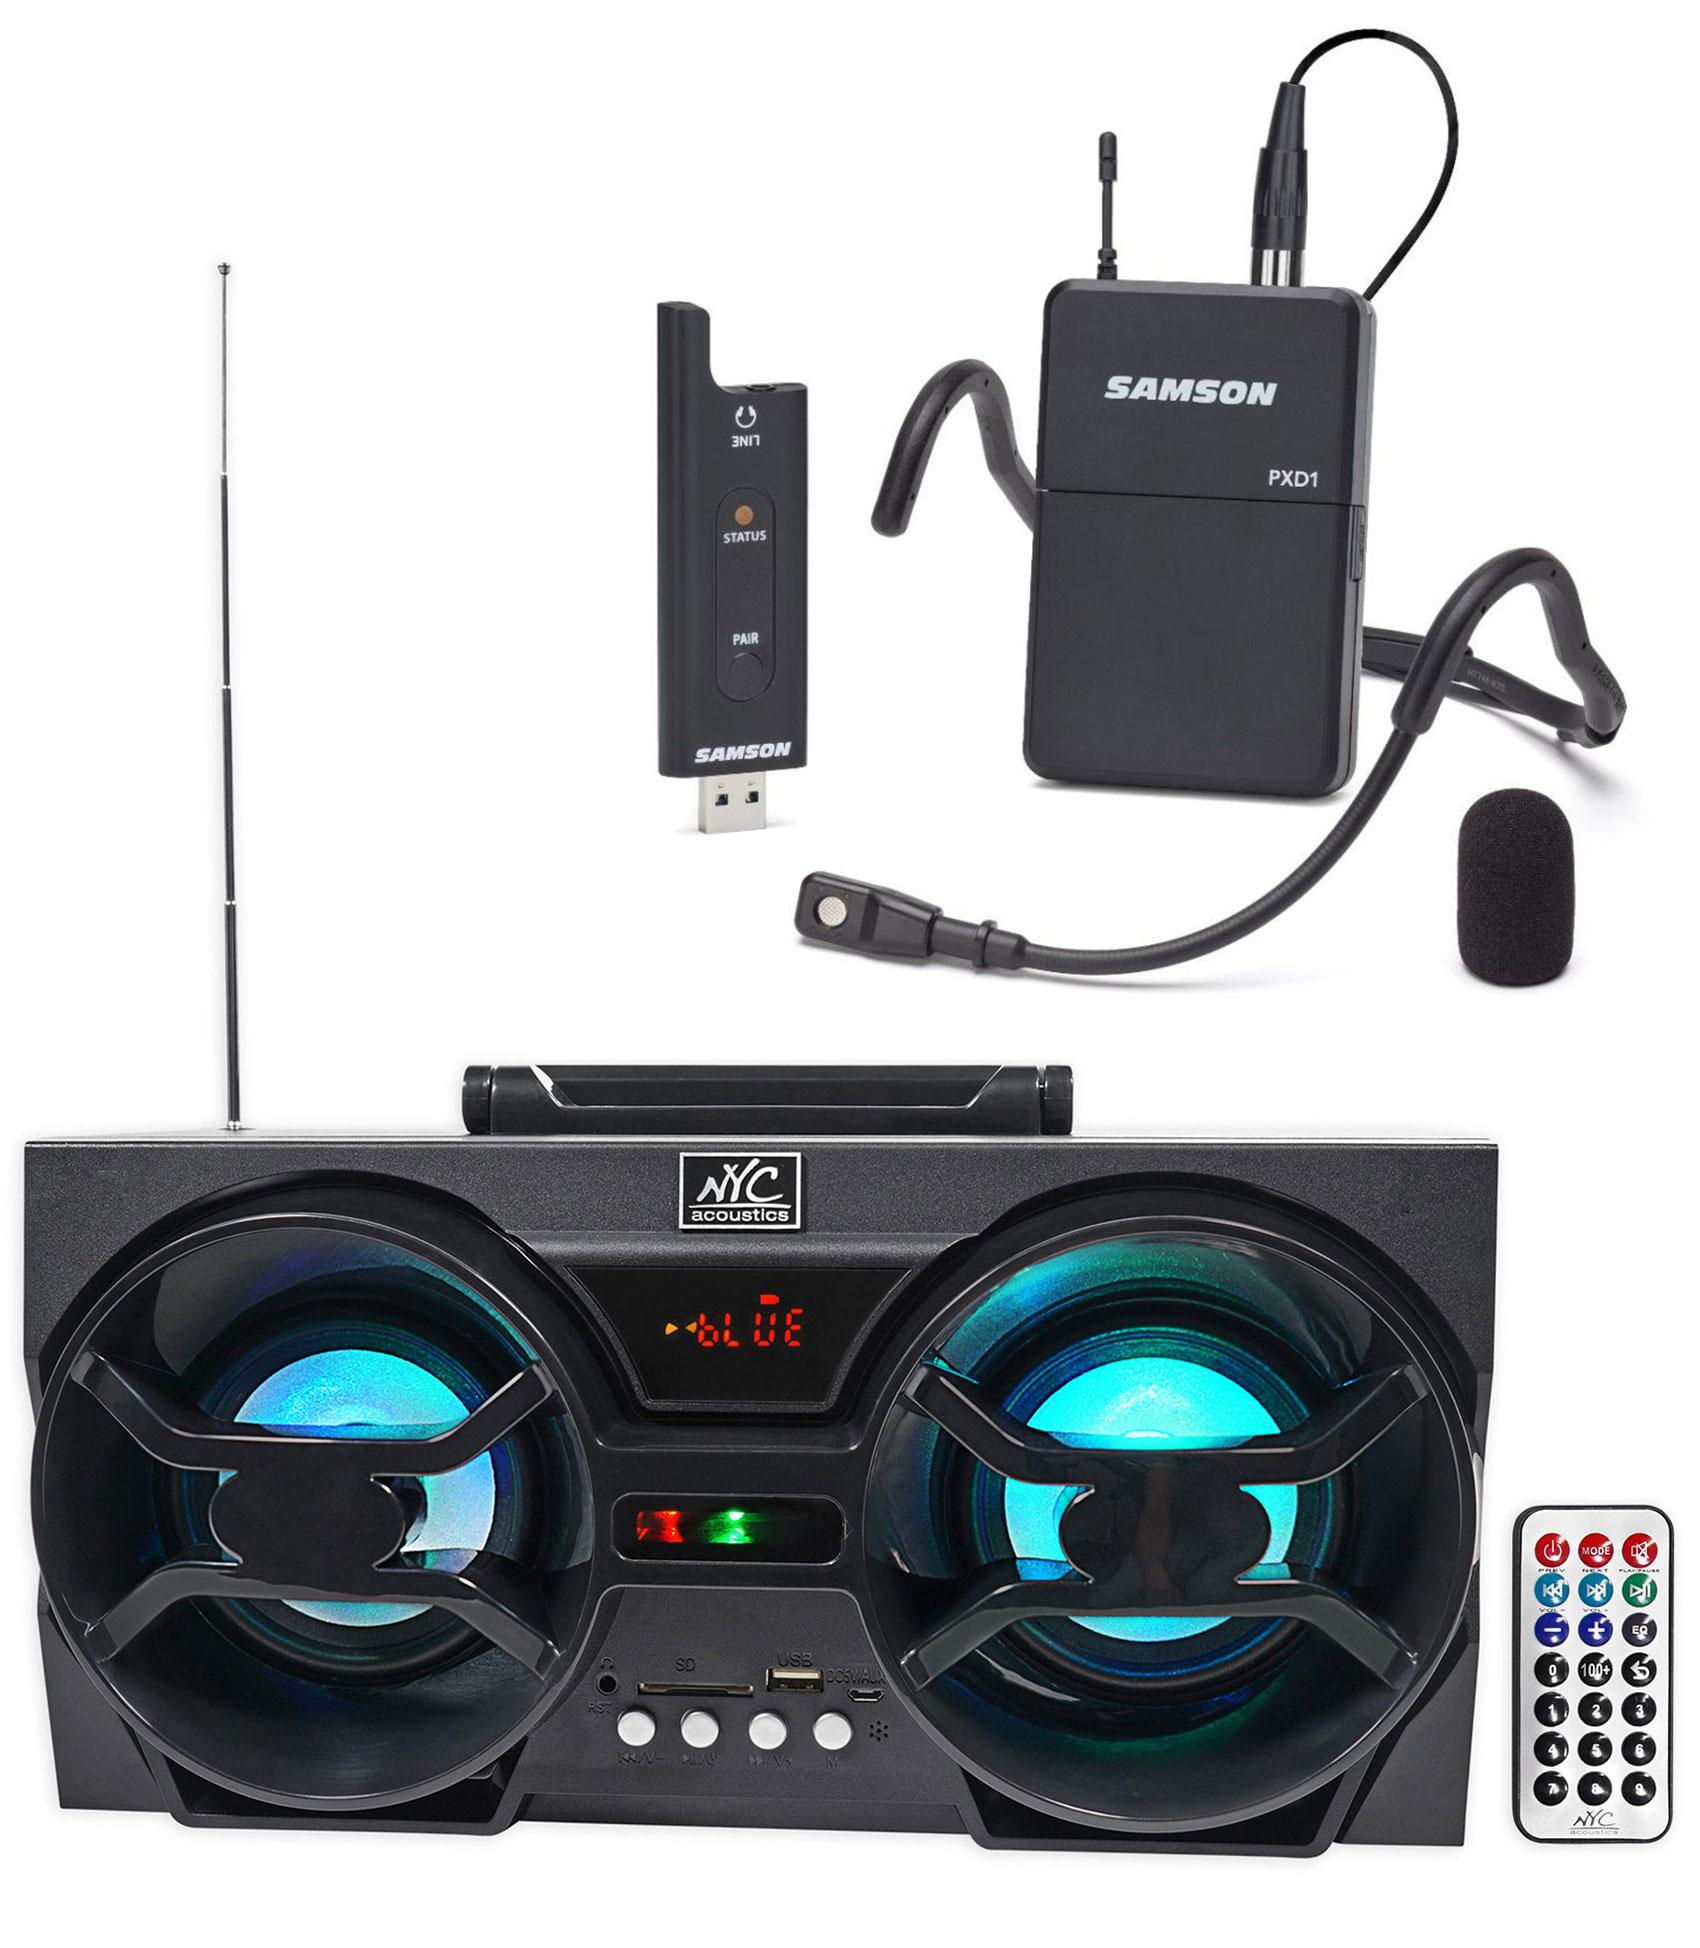 Samson Stage XPD2 USB Beltpack Wireless Fitness Headset+Bluetooth Headphones